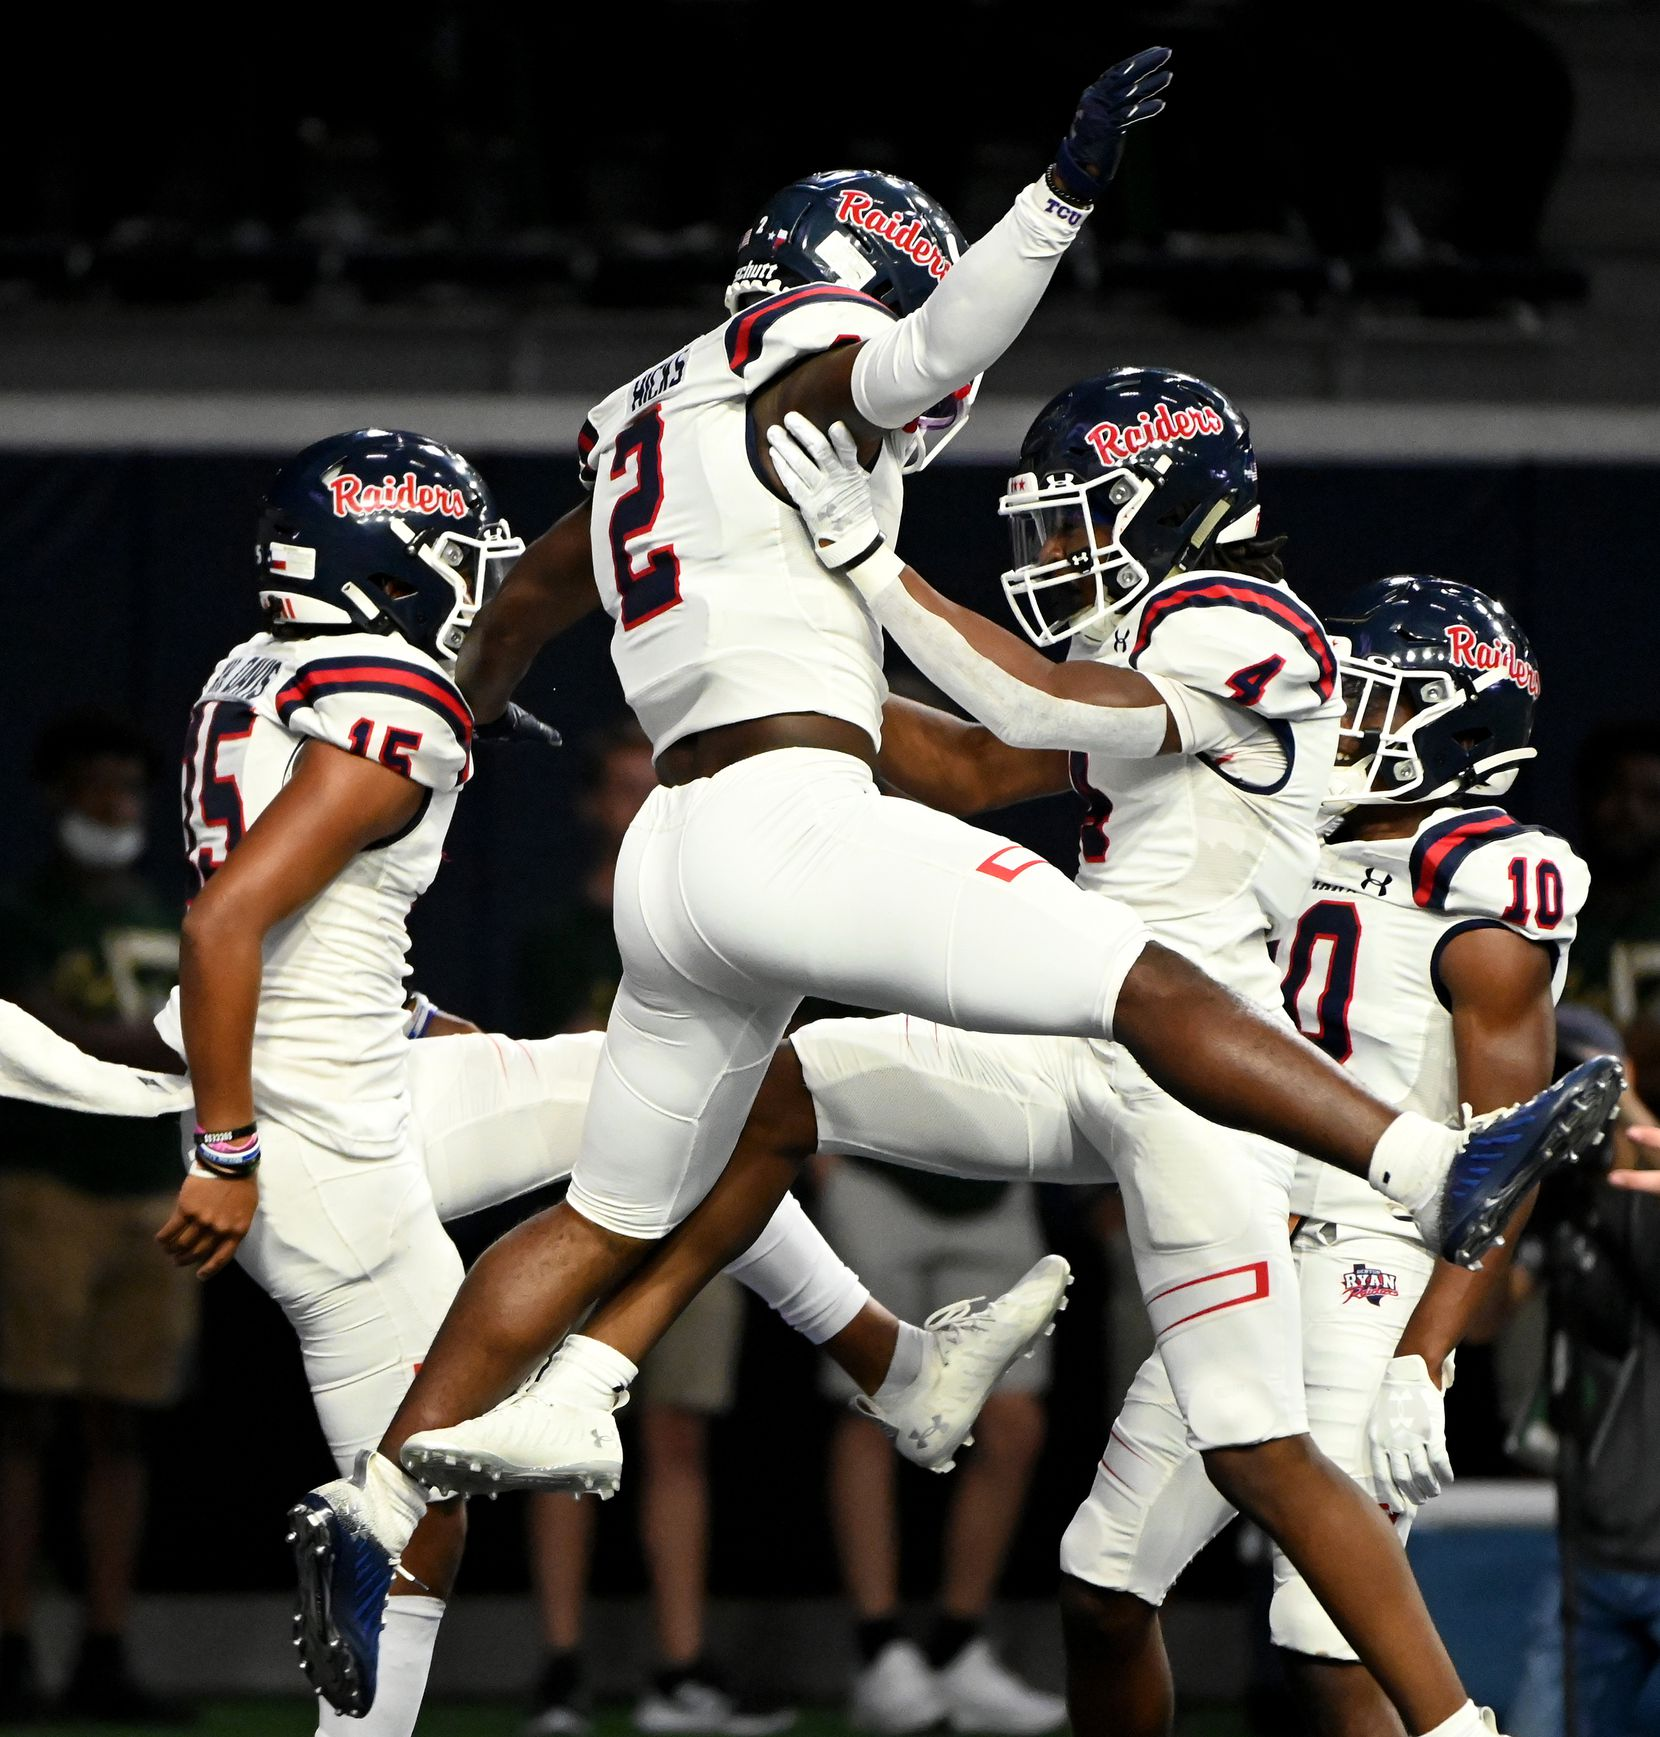 Denton Ryan's Kalib Hicks (2) celebrates his rushing touchdown with Khalon Davis (15) nd Jordyn Bailey in the first half during a high school football game between Longview and Denton Ryan, Saturday, Aug. 28, 2021, in Frisco, Texas. (Matt Strasen/Special Contributor)